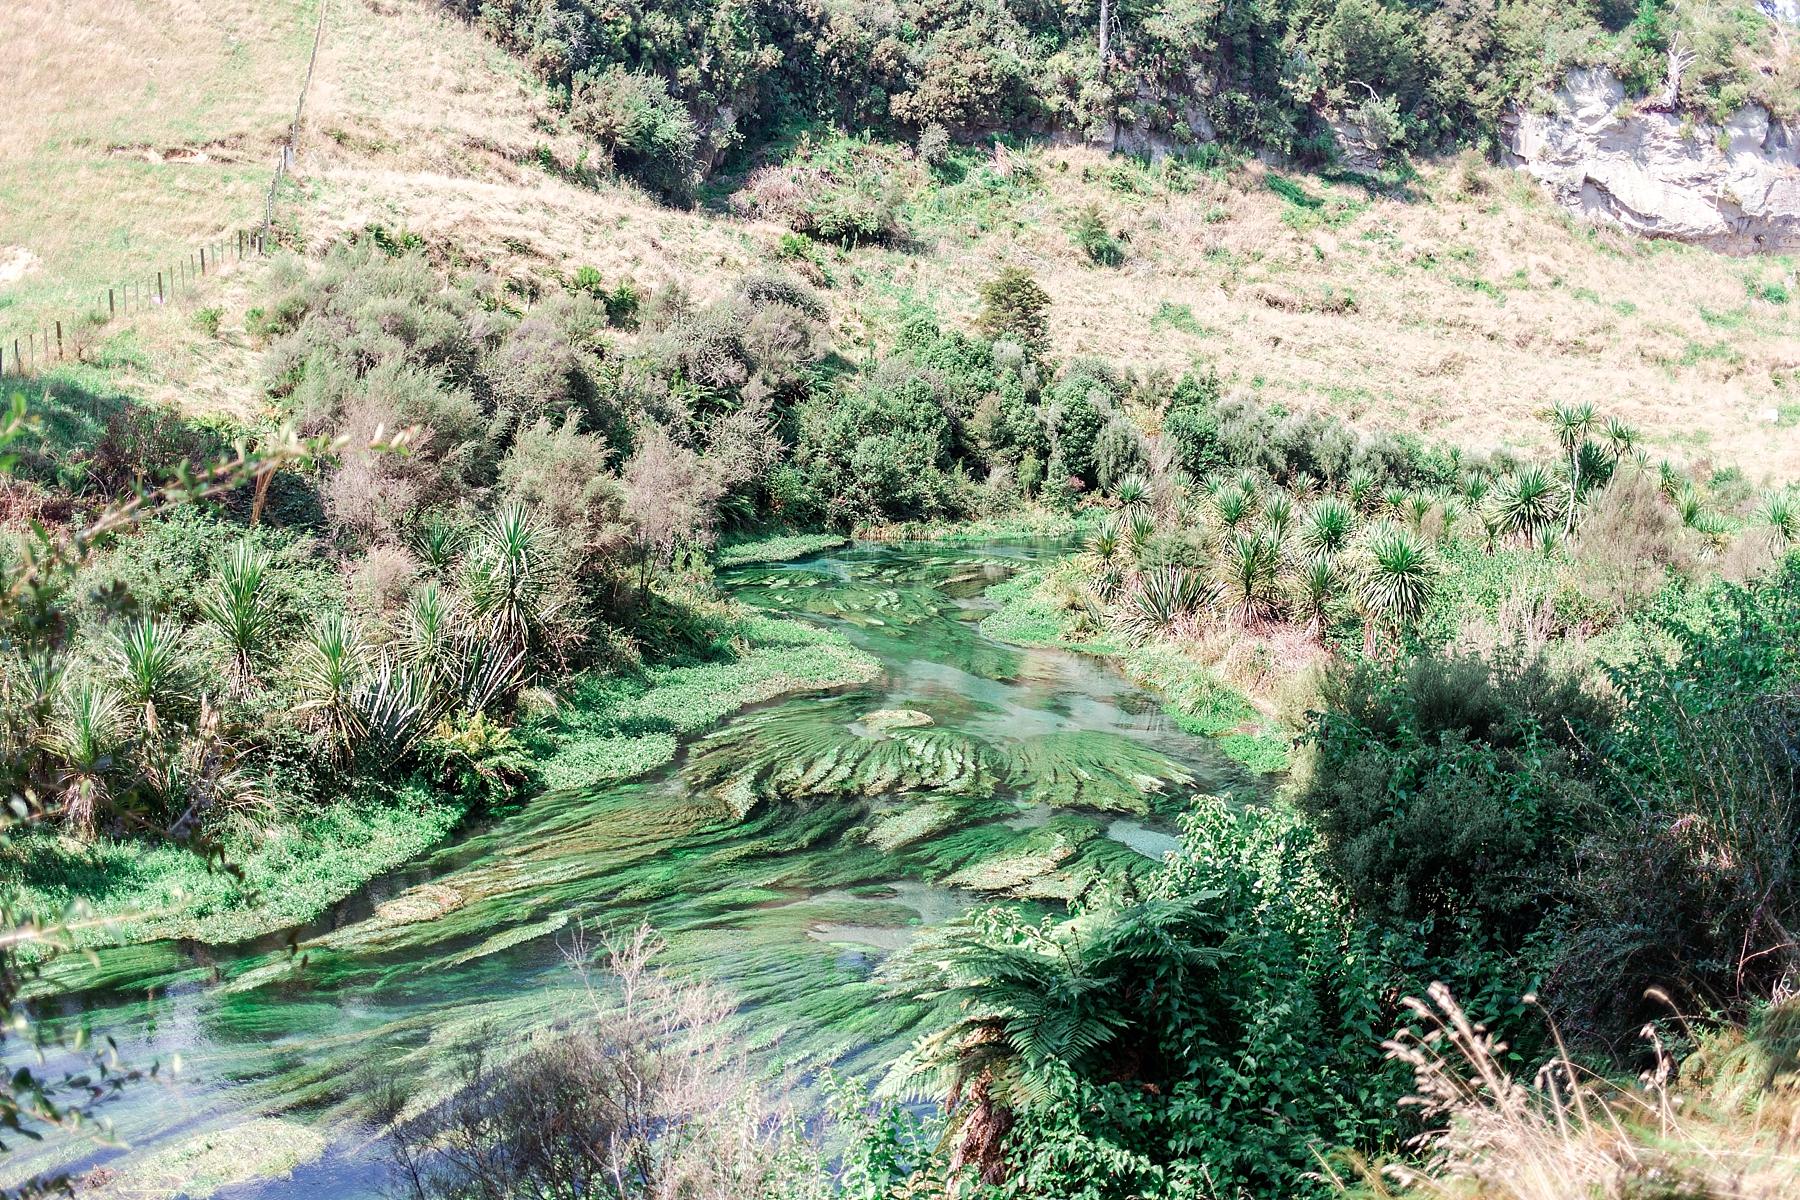 north-island-blue-springs-putaruru-new-zealand-scenery_0235.jpg